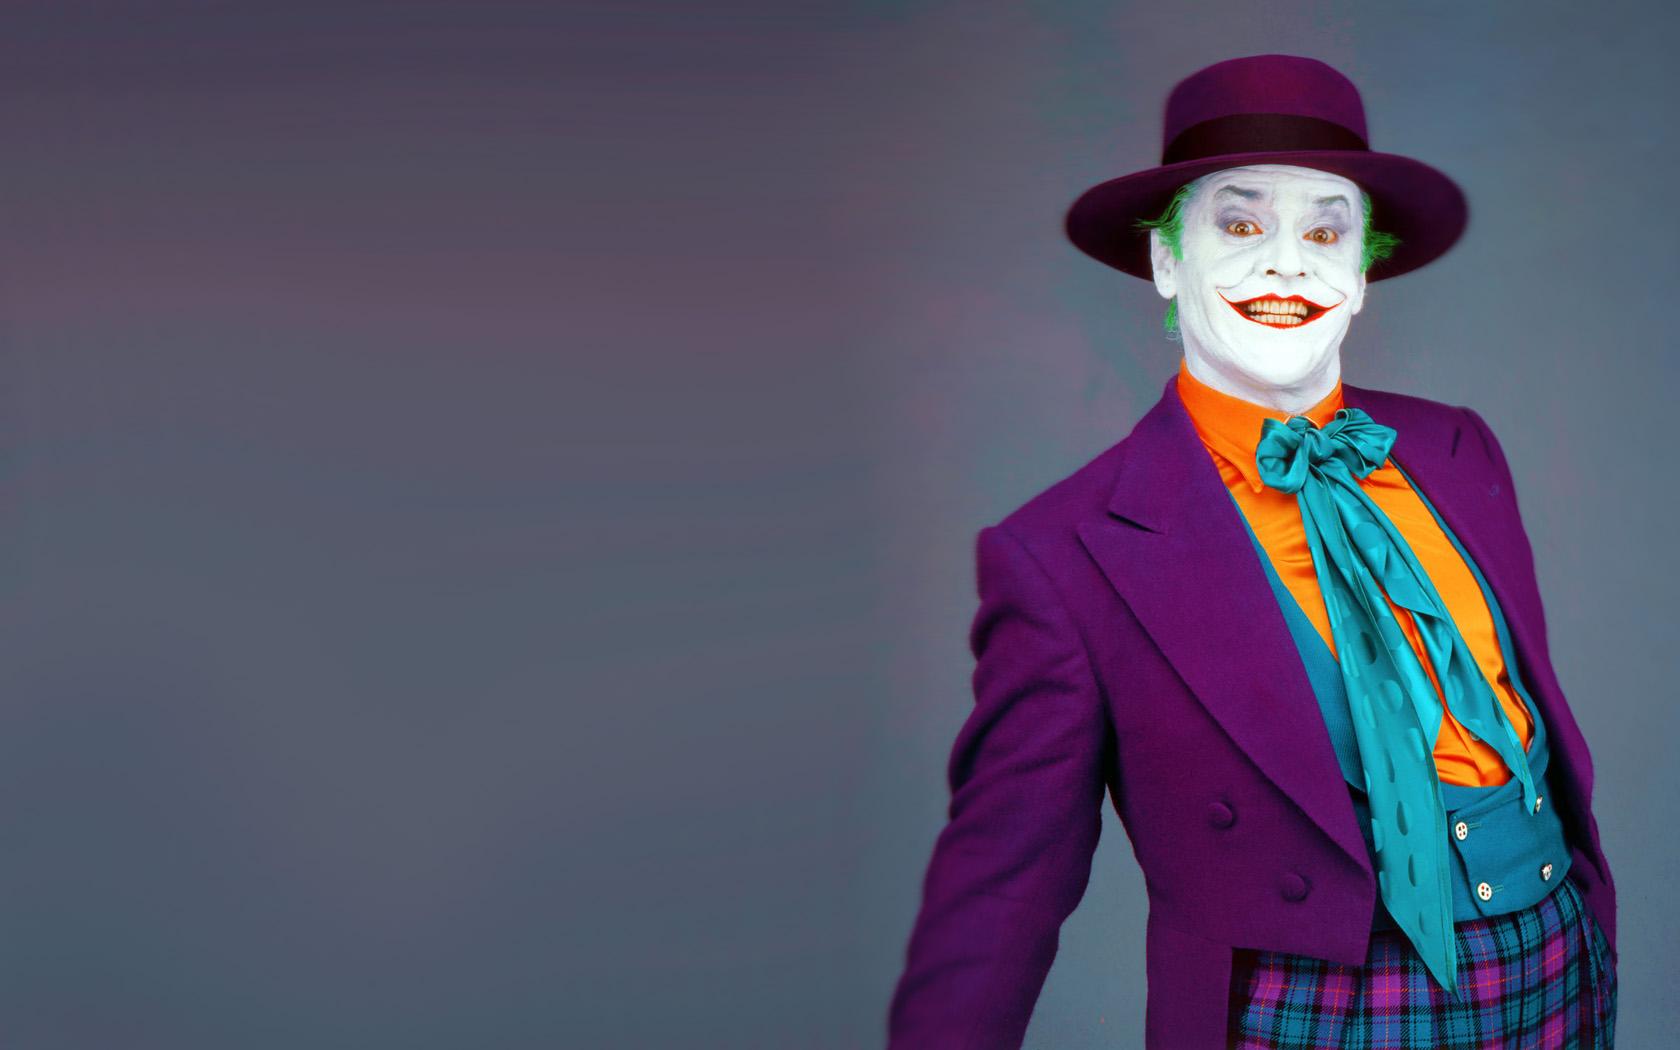 the joker jack nicholson HD Wallpaper   Celebrity Actress 55305 1680x1050